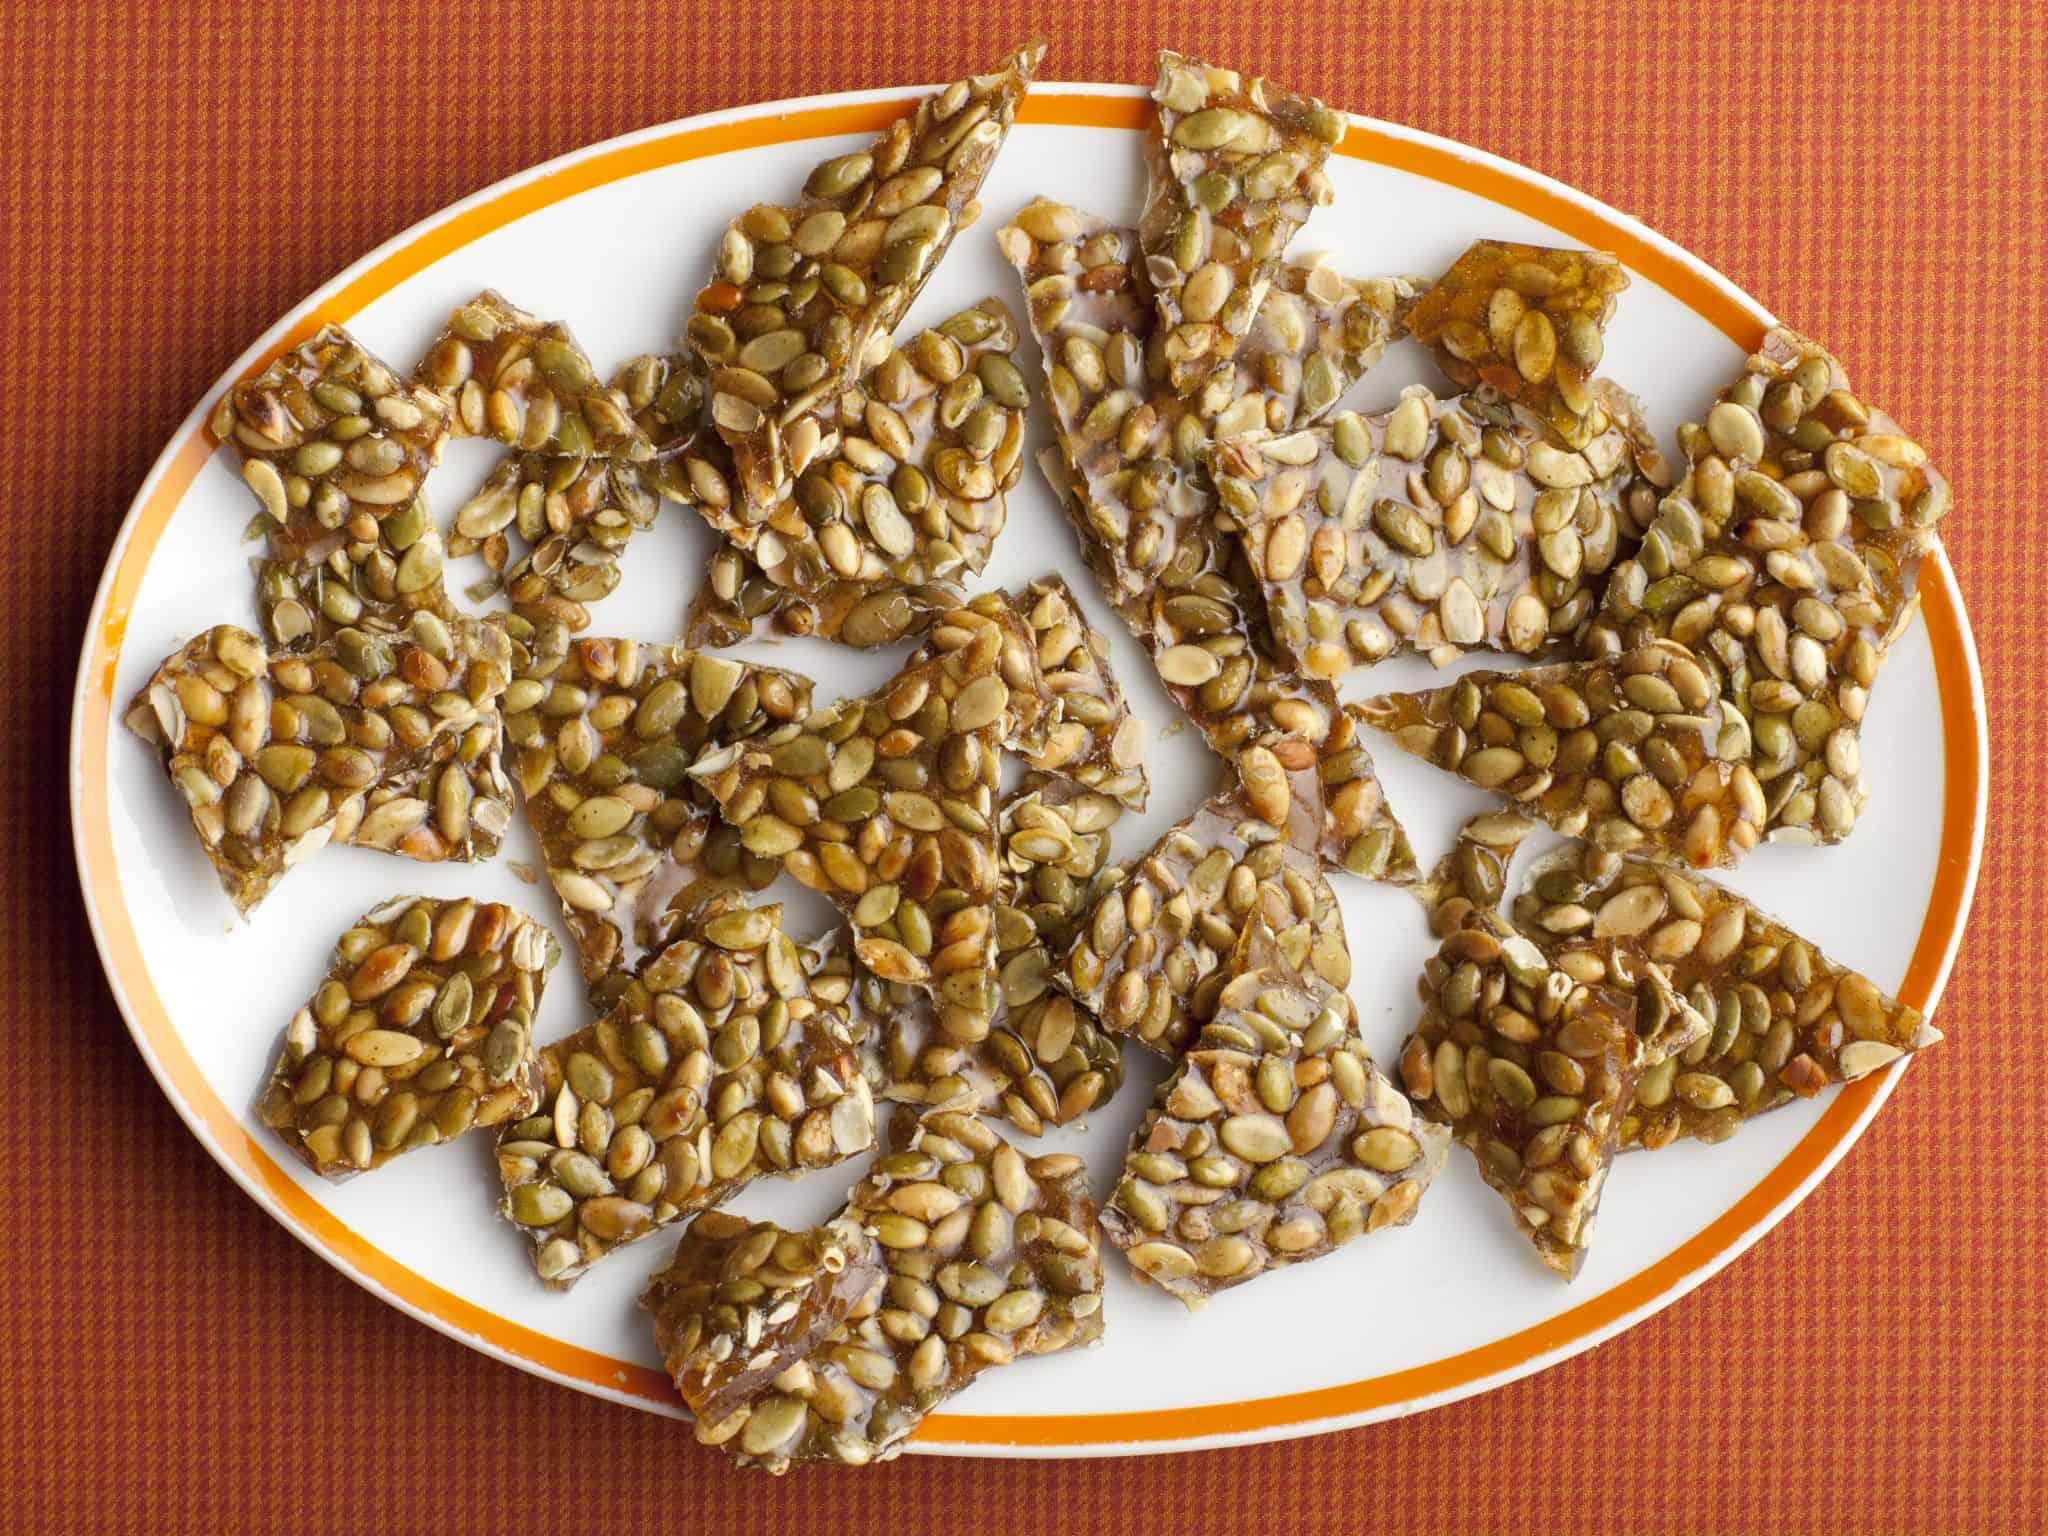 Cinnamon and cayenne papper pumpkin seed brittle